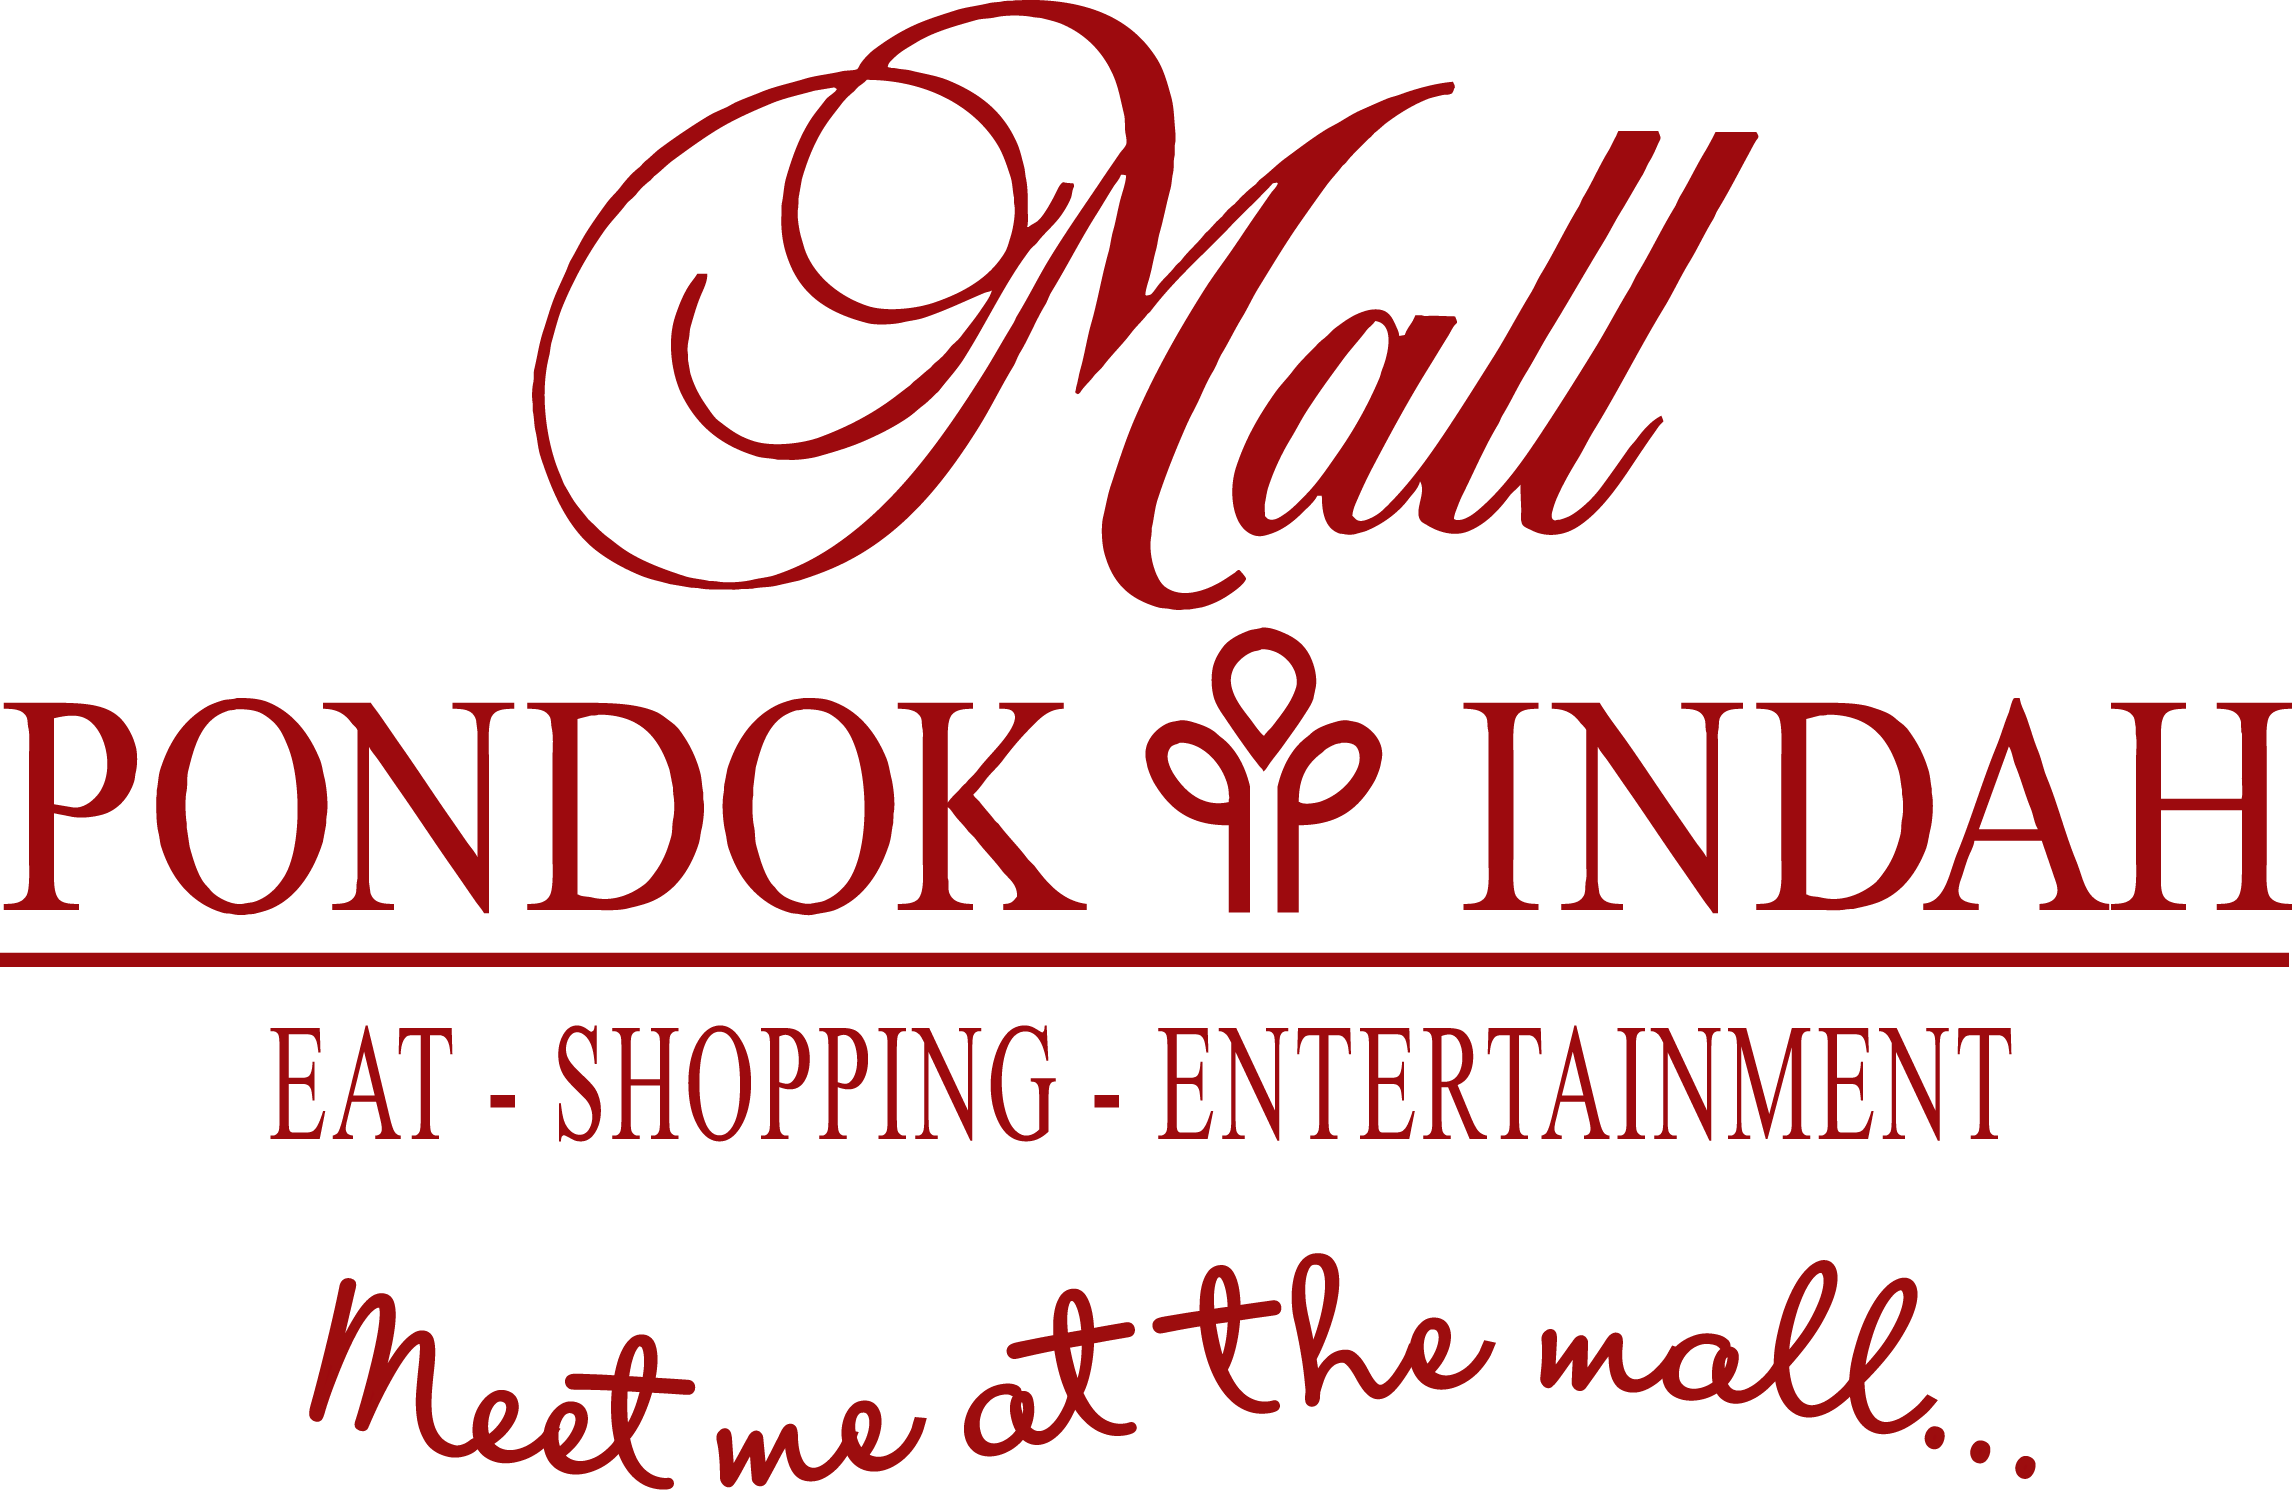 https://www.pondokindahmall.co.id/assets//js/timthumb/timthumb.php?src=https://www.pondokindahmall.co.id//assets/img/news/1543893272_246_0_1485423787_PIM_Logo.png&q=100&a=c&w=300&h=200